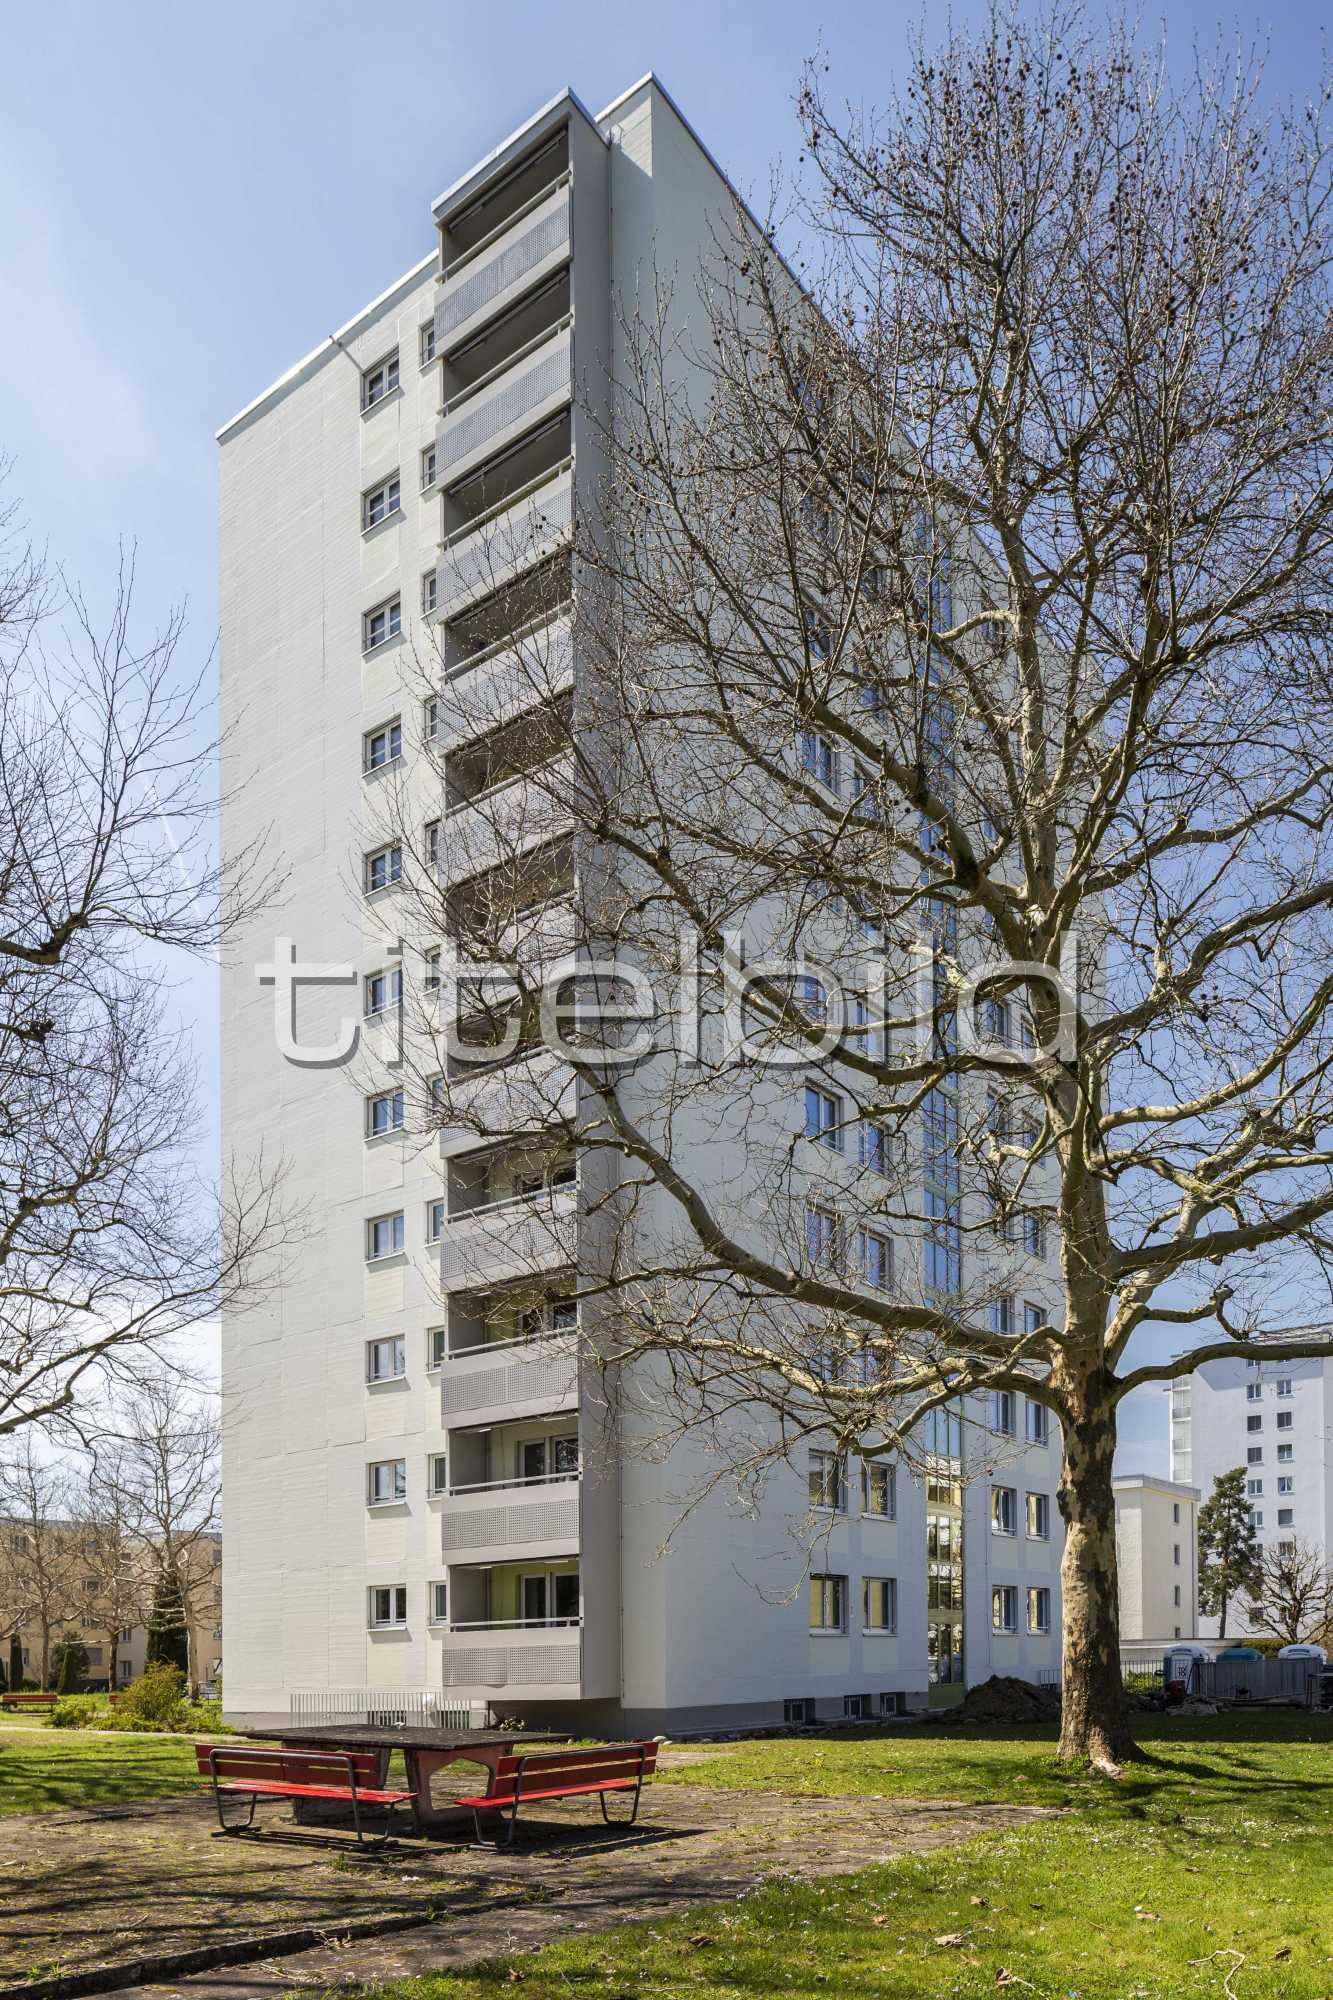 Projektbild-Nr. 3: Waldhofstrasse 54